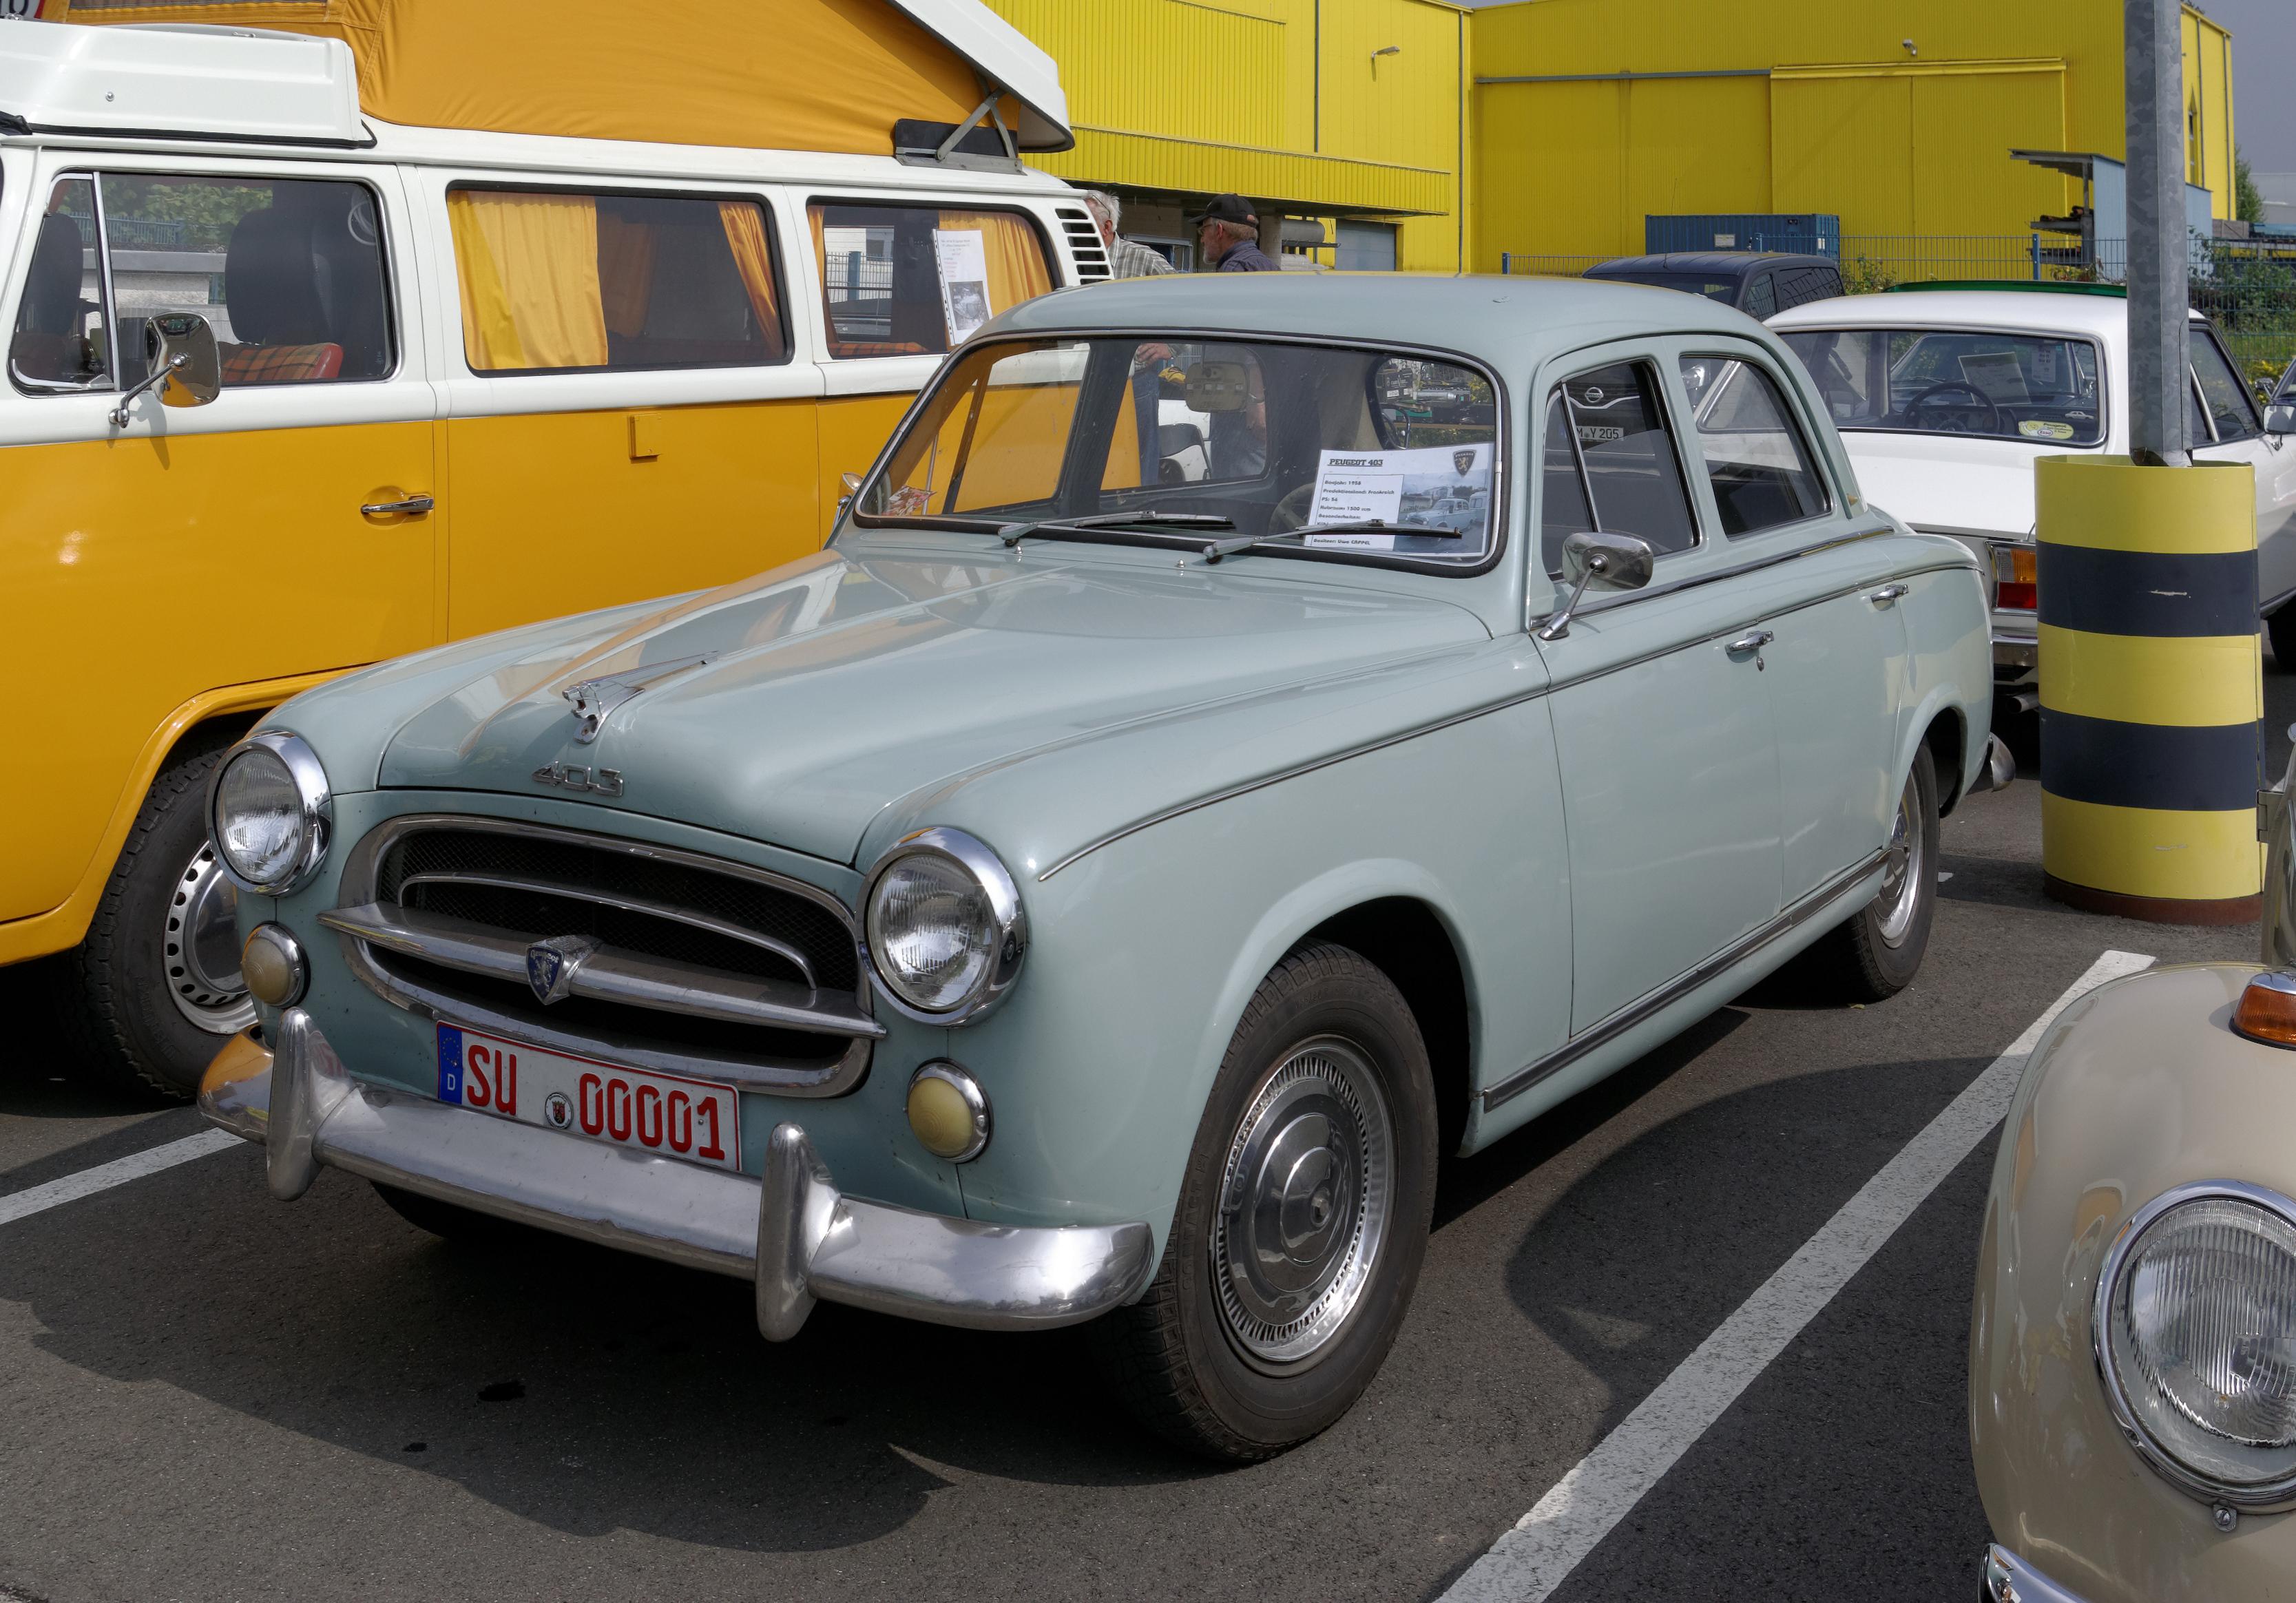 File:Peugeot 403 2014-09-07 13-01-55.jpg